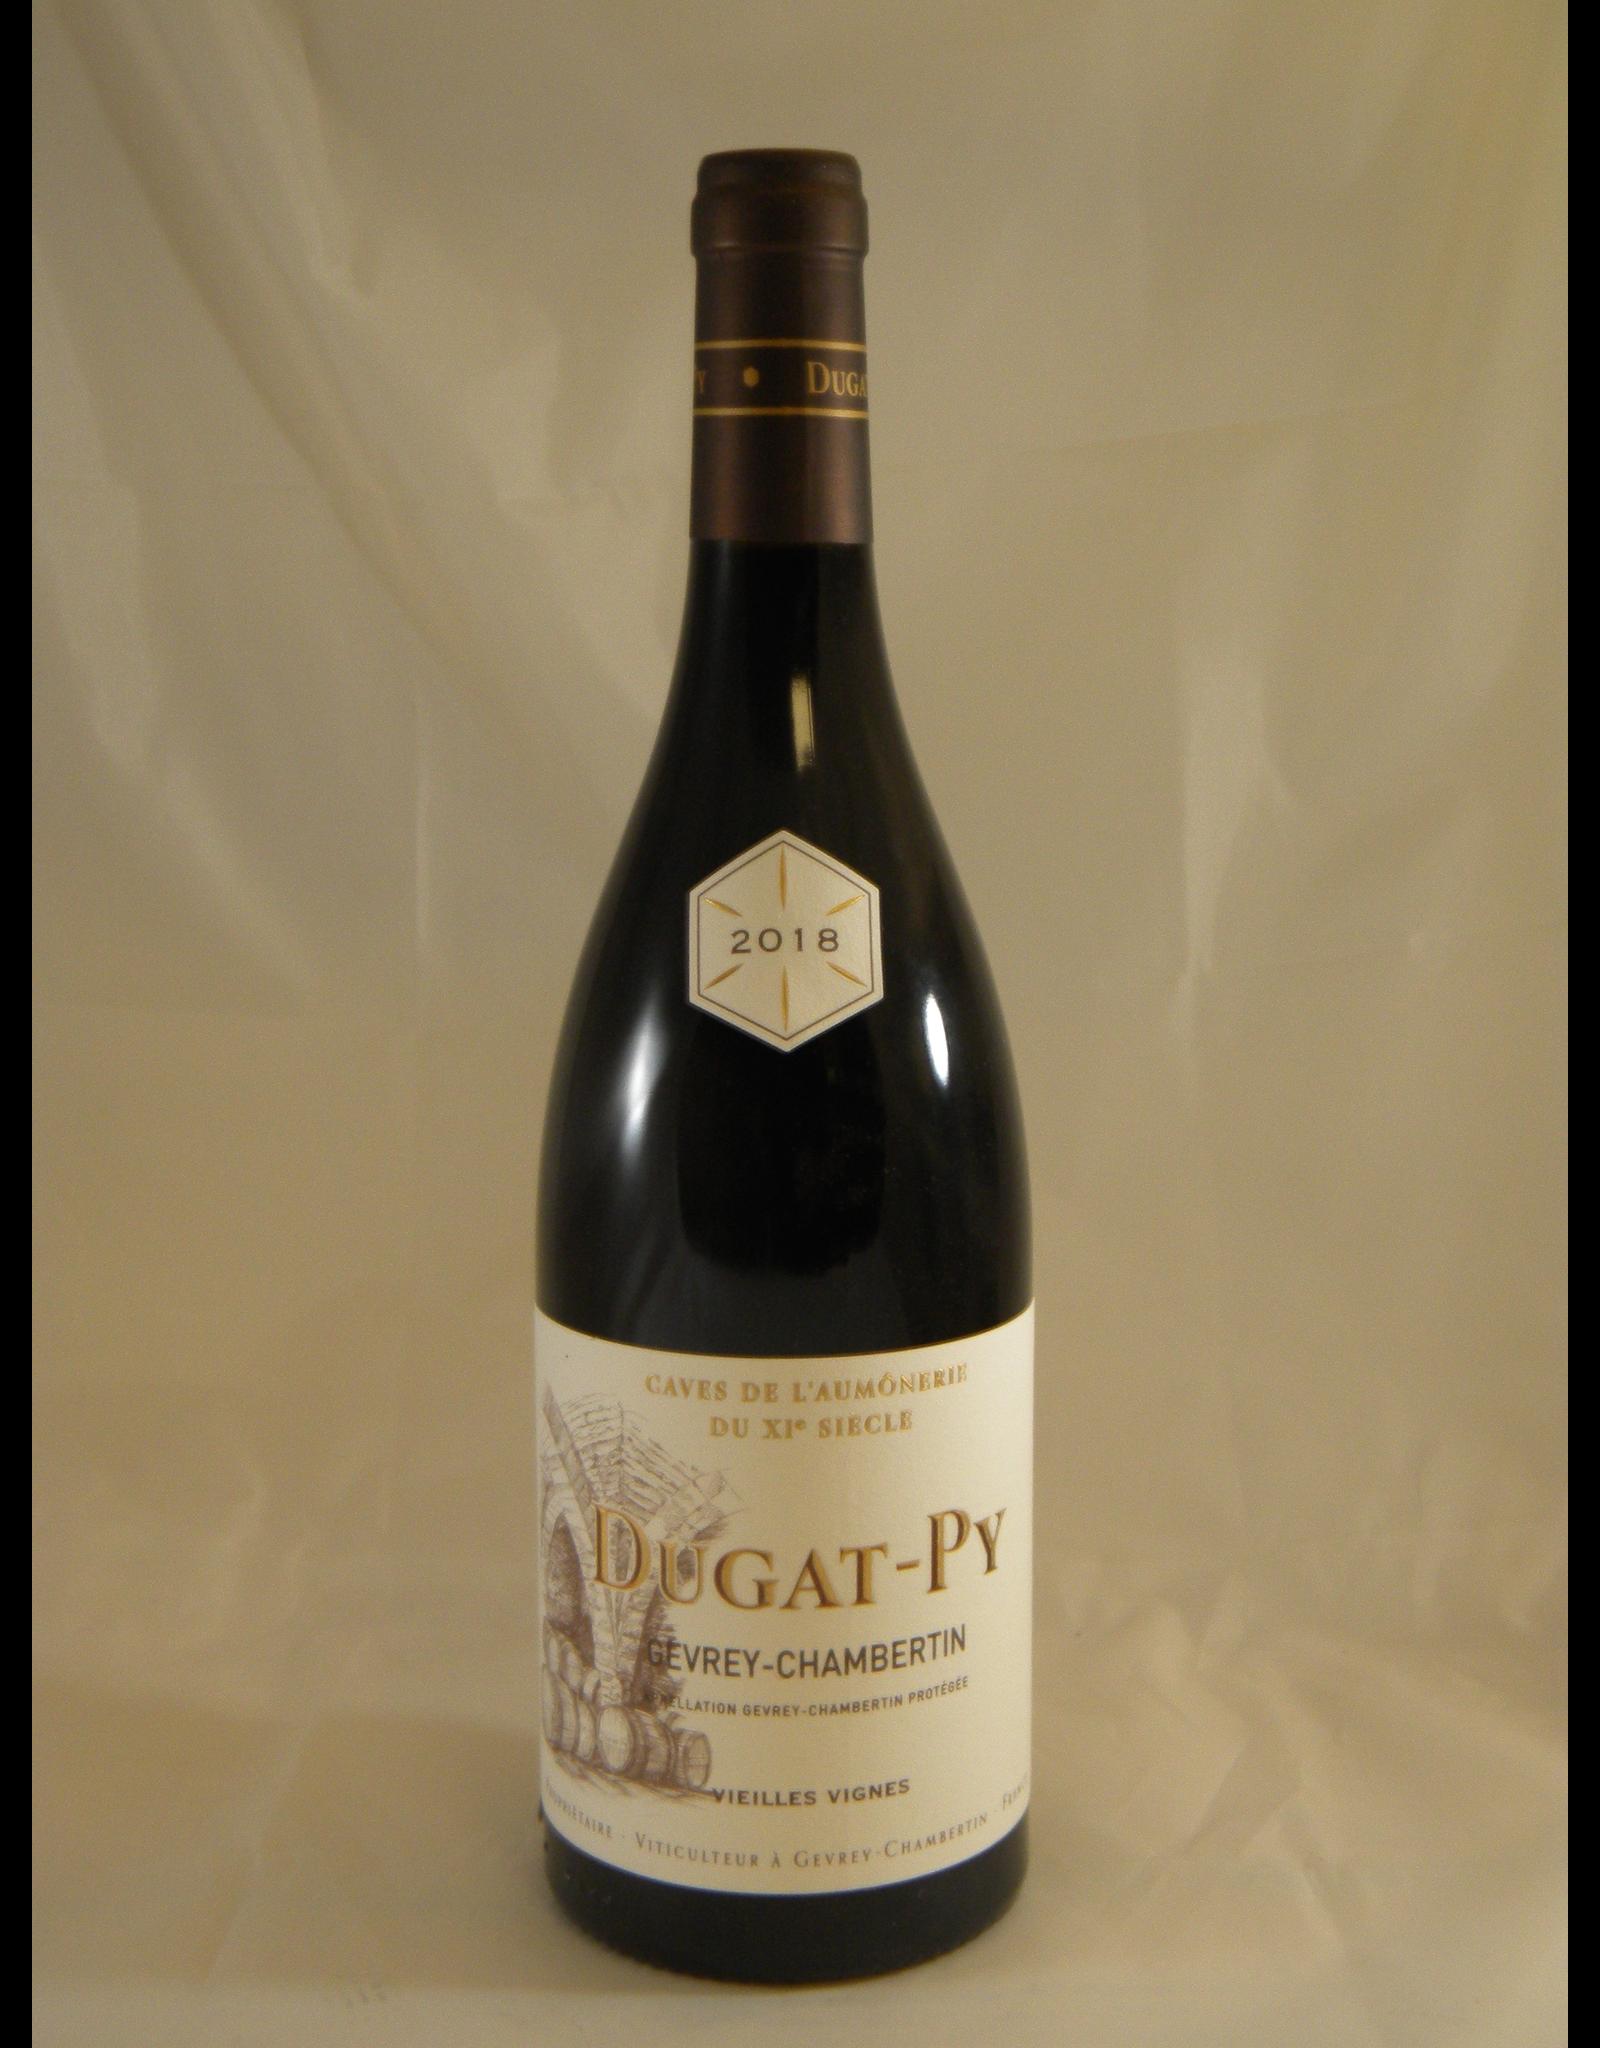 Dugat-Py Dugat-Py Gevrey Chambertin Vieilles Vignes 2018